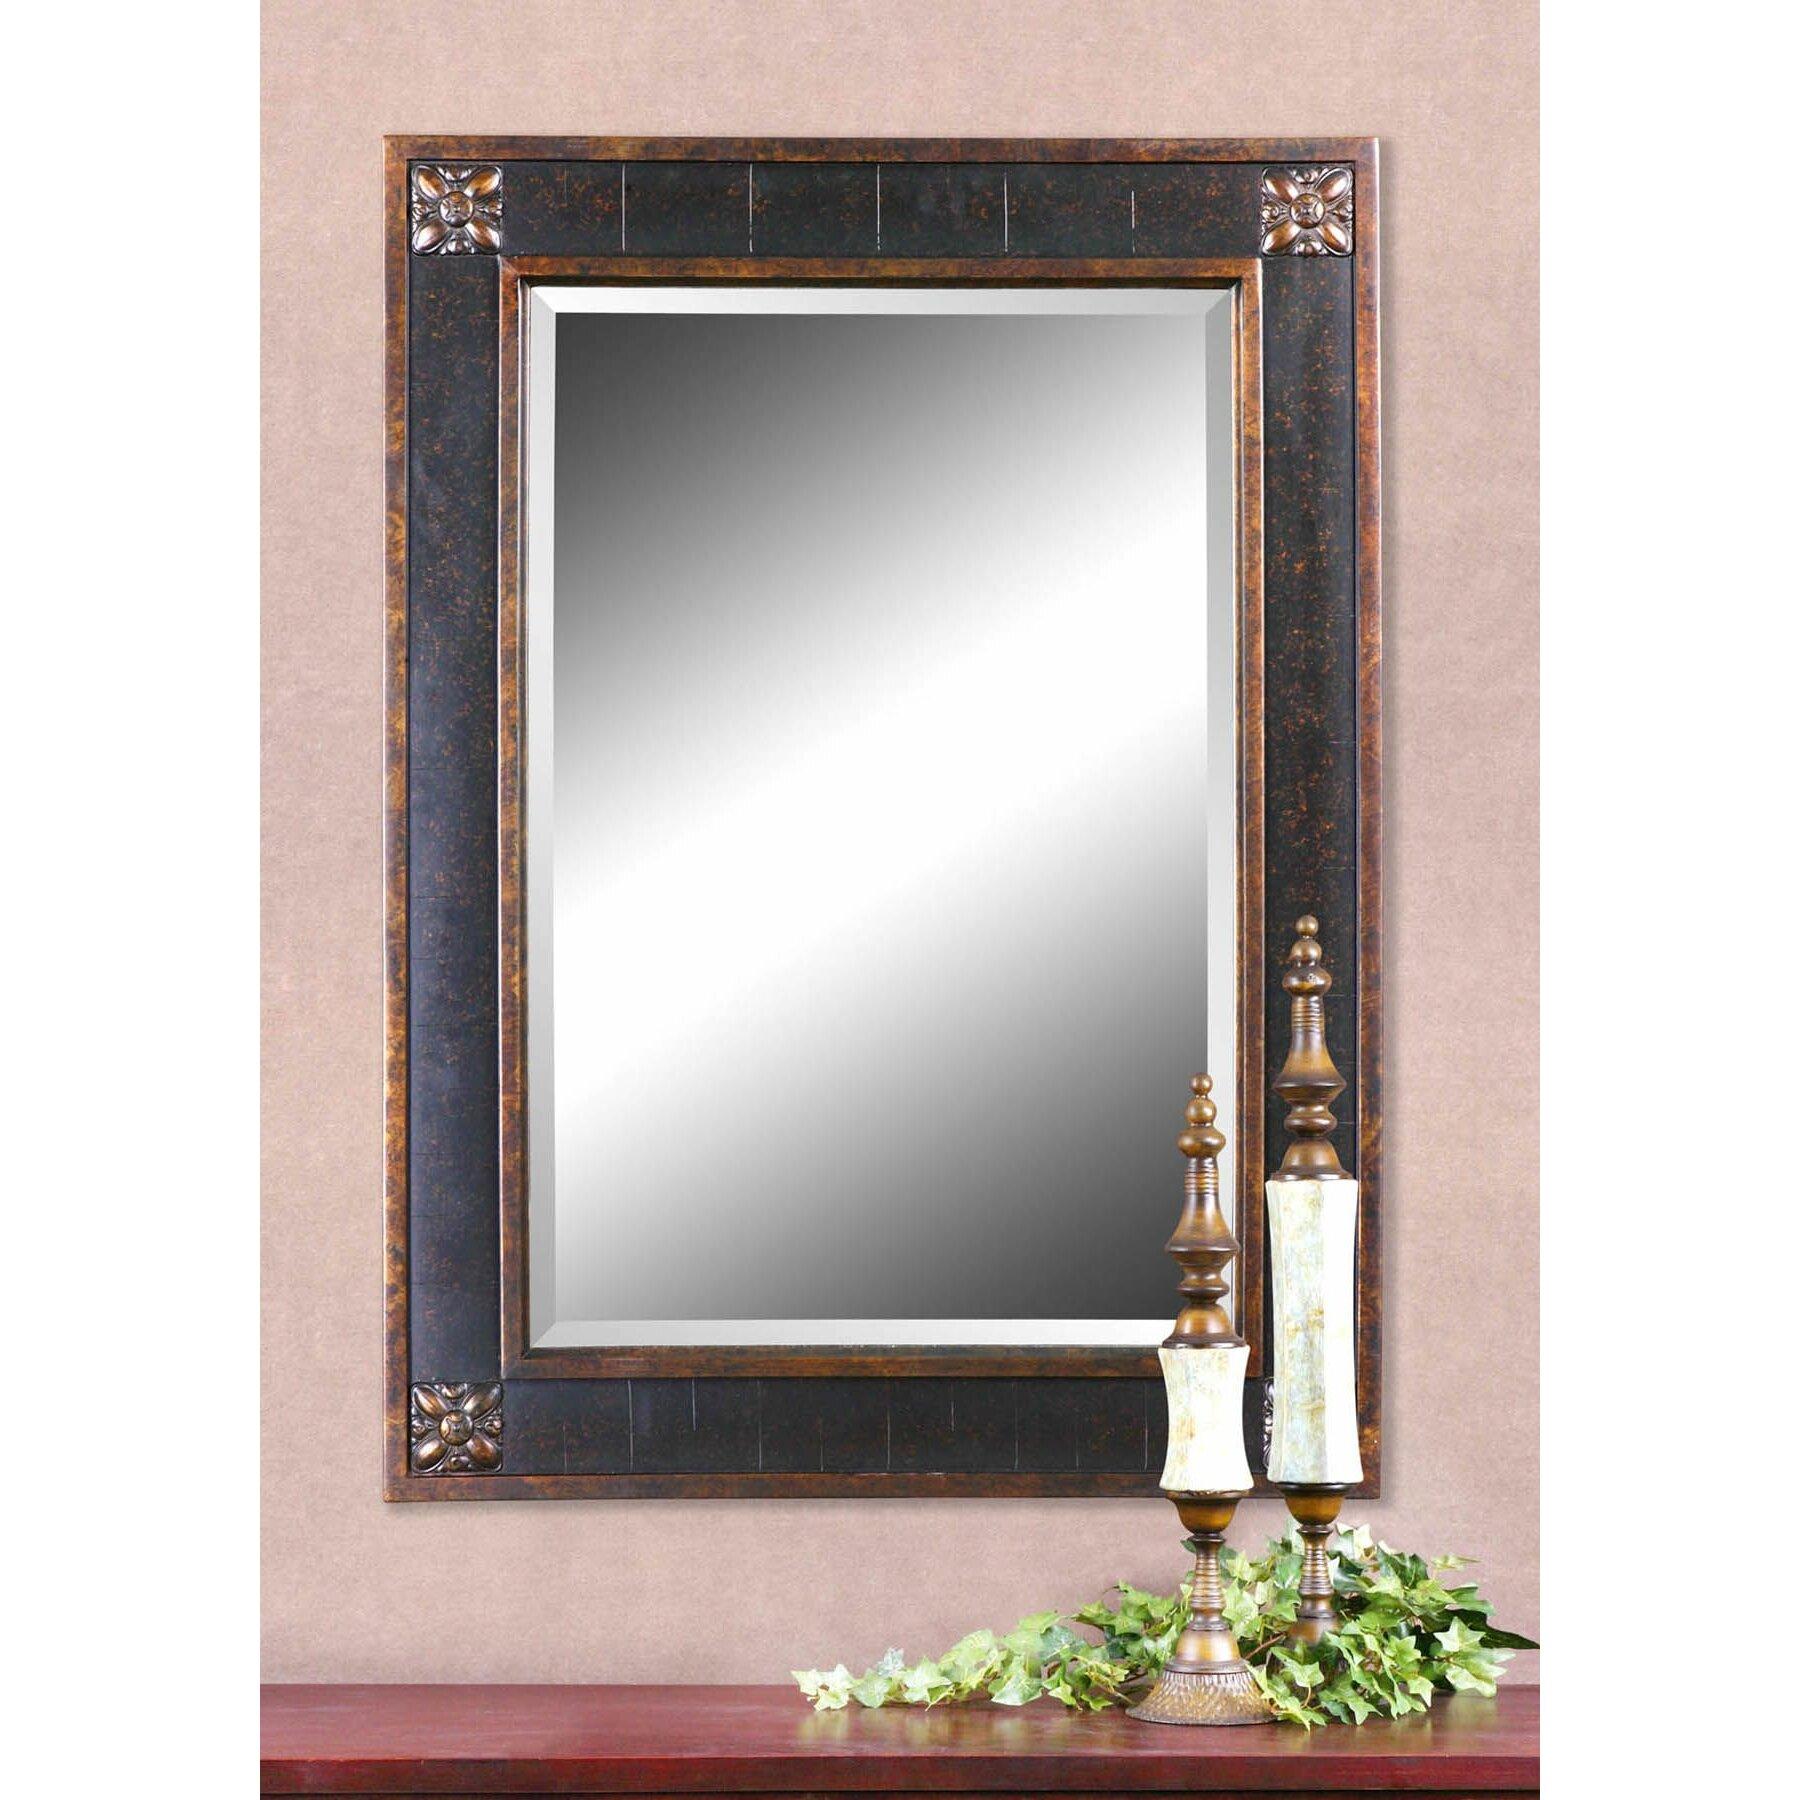 rosalind wheeler rectangular beveled vanity mirror in distressed walnut brown reviews wayfair. Black Bedroom Furniture Sets. Home Design Ideas